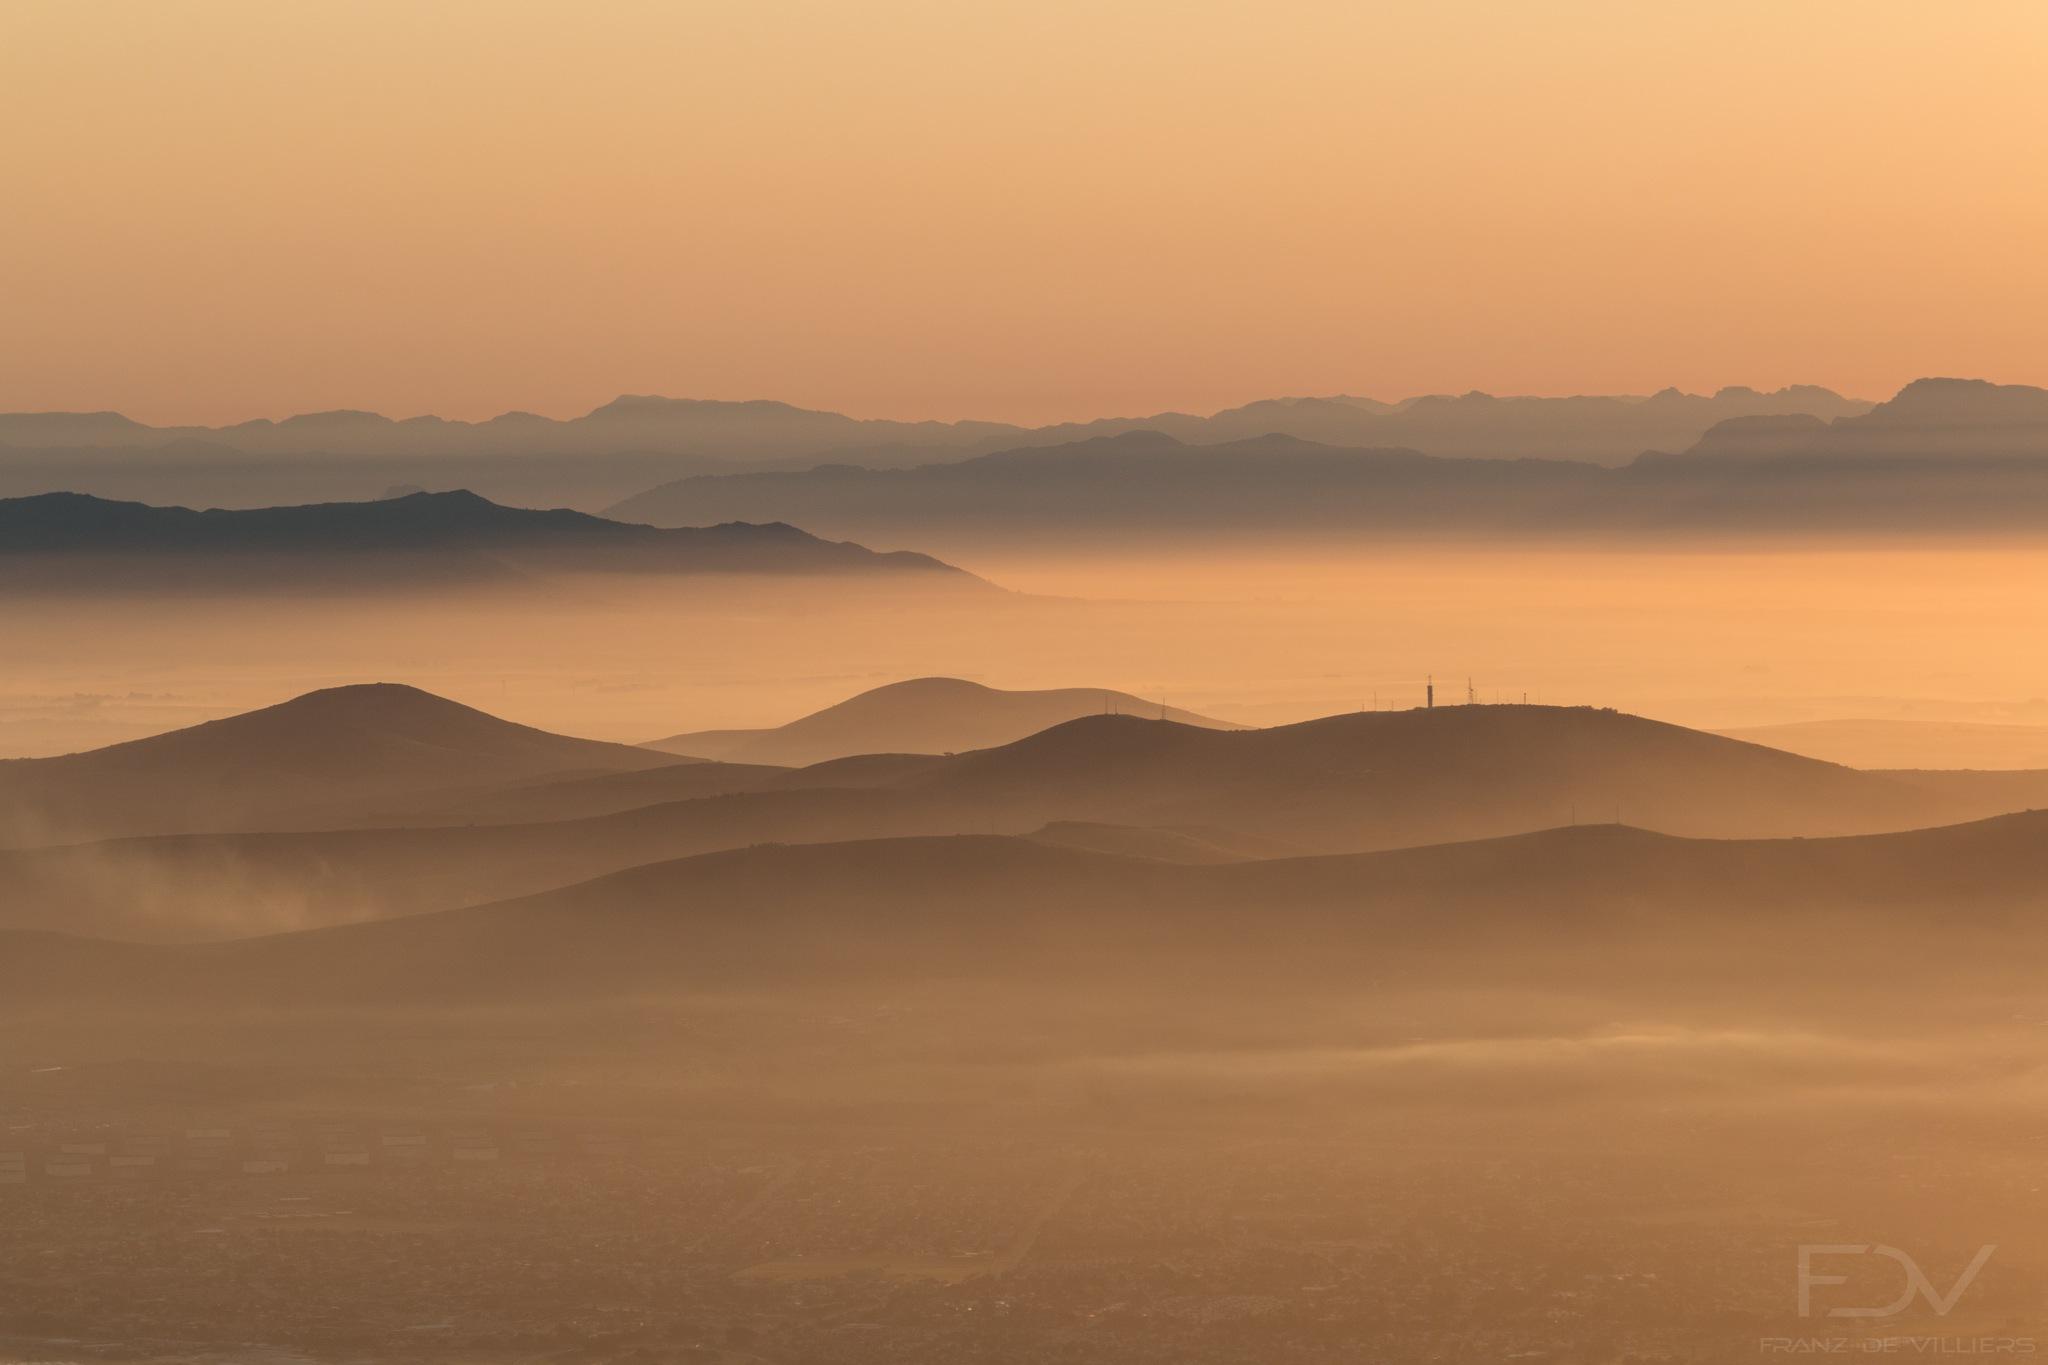 Golden Hills. by franzdev